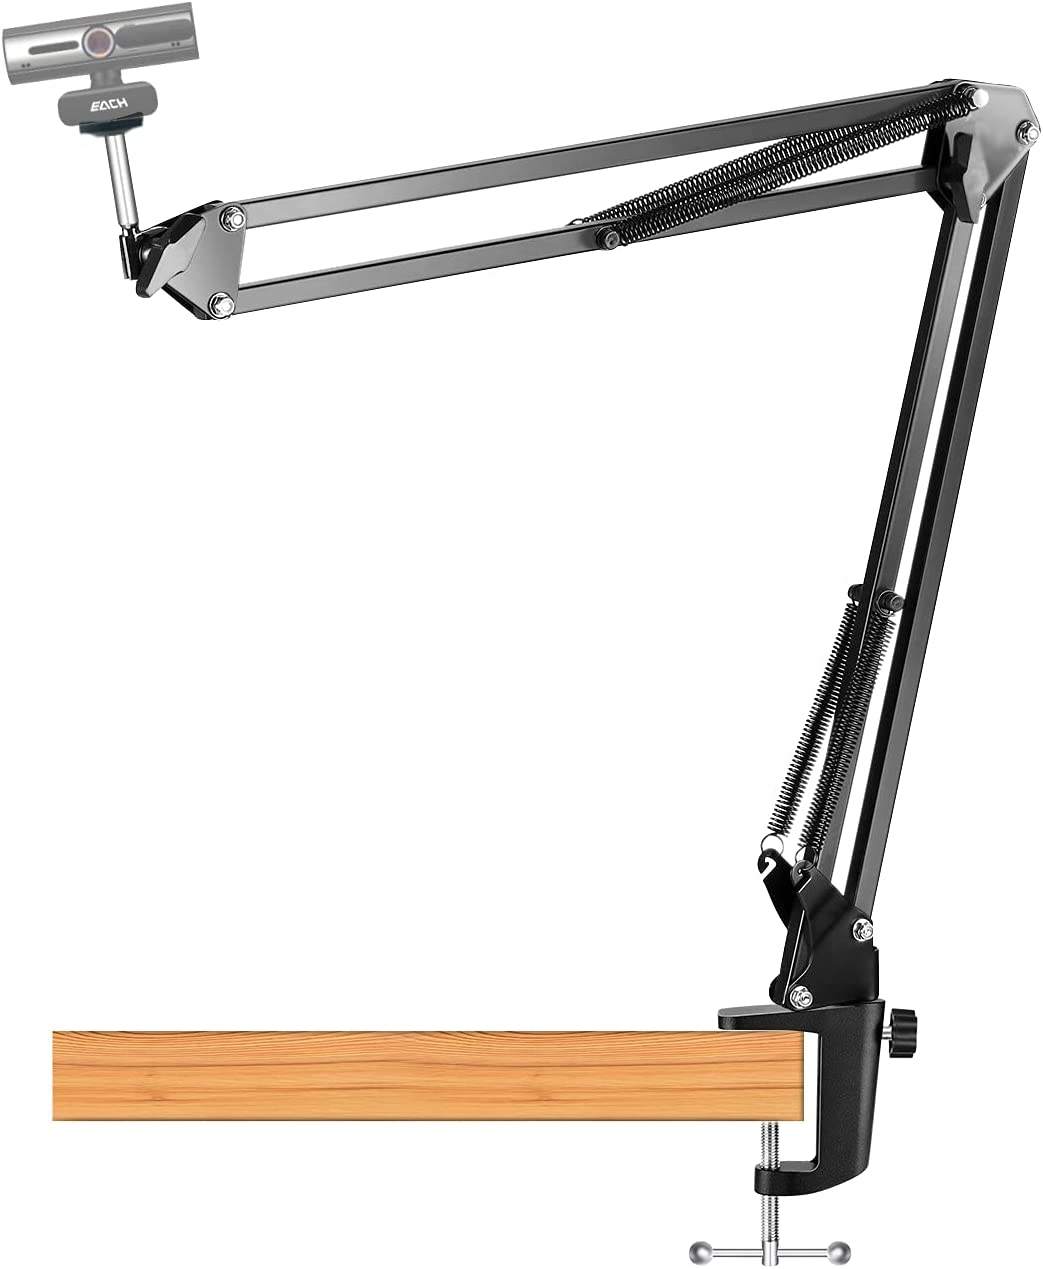 Flexible and Adjustable Suspension, Boom Scissor Long Arm Swivel Holder for Webcam C922 C930 C920